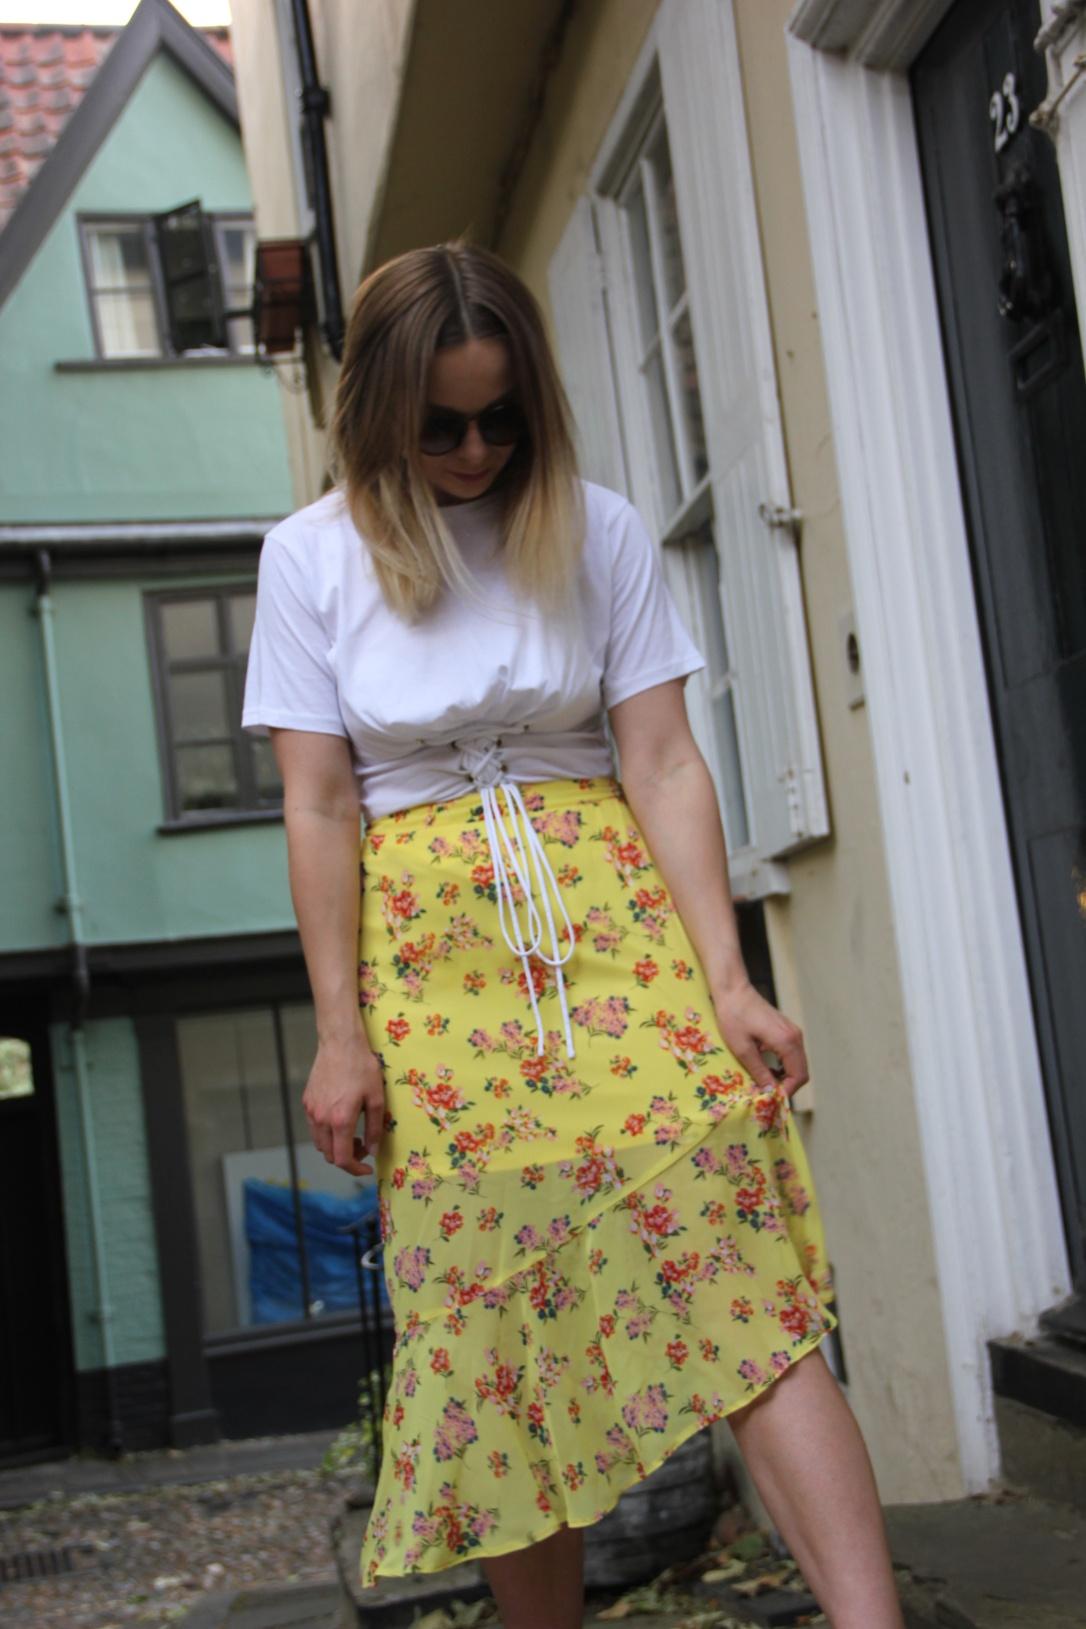 Styling a yellow skirt